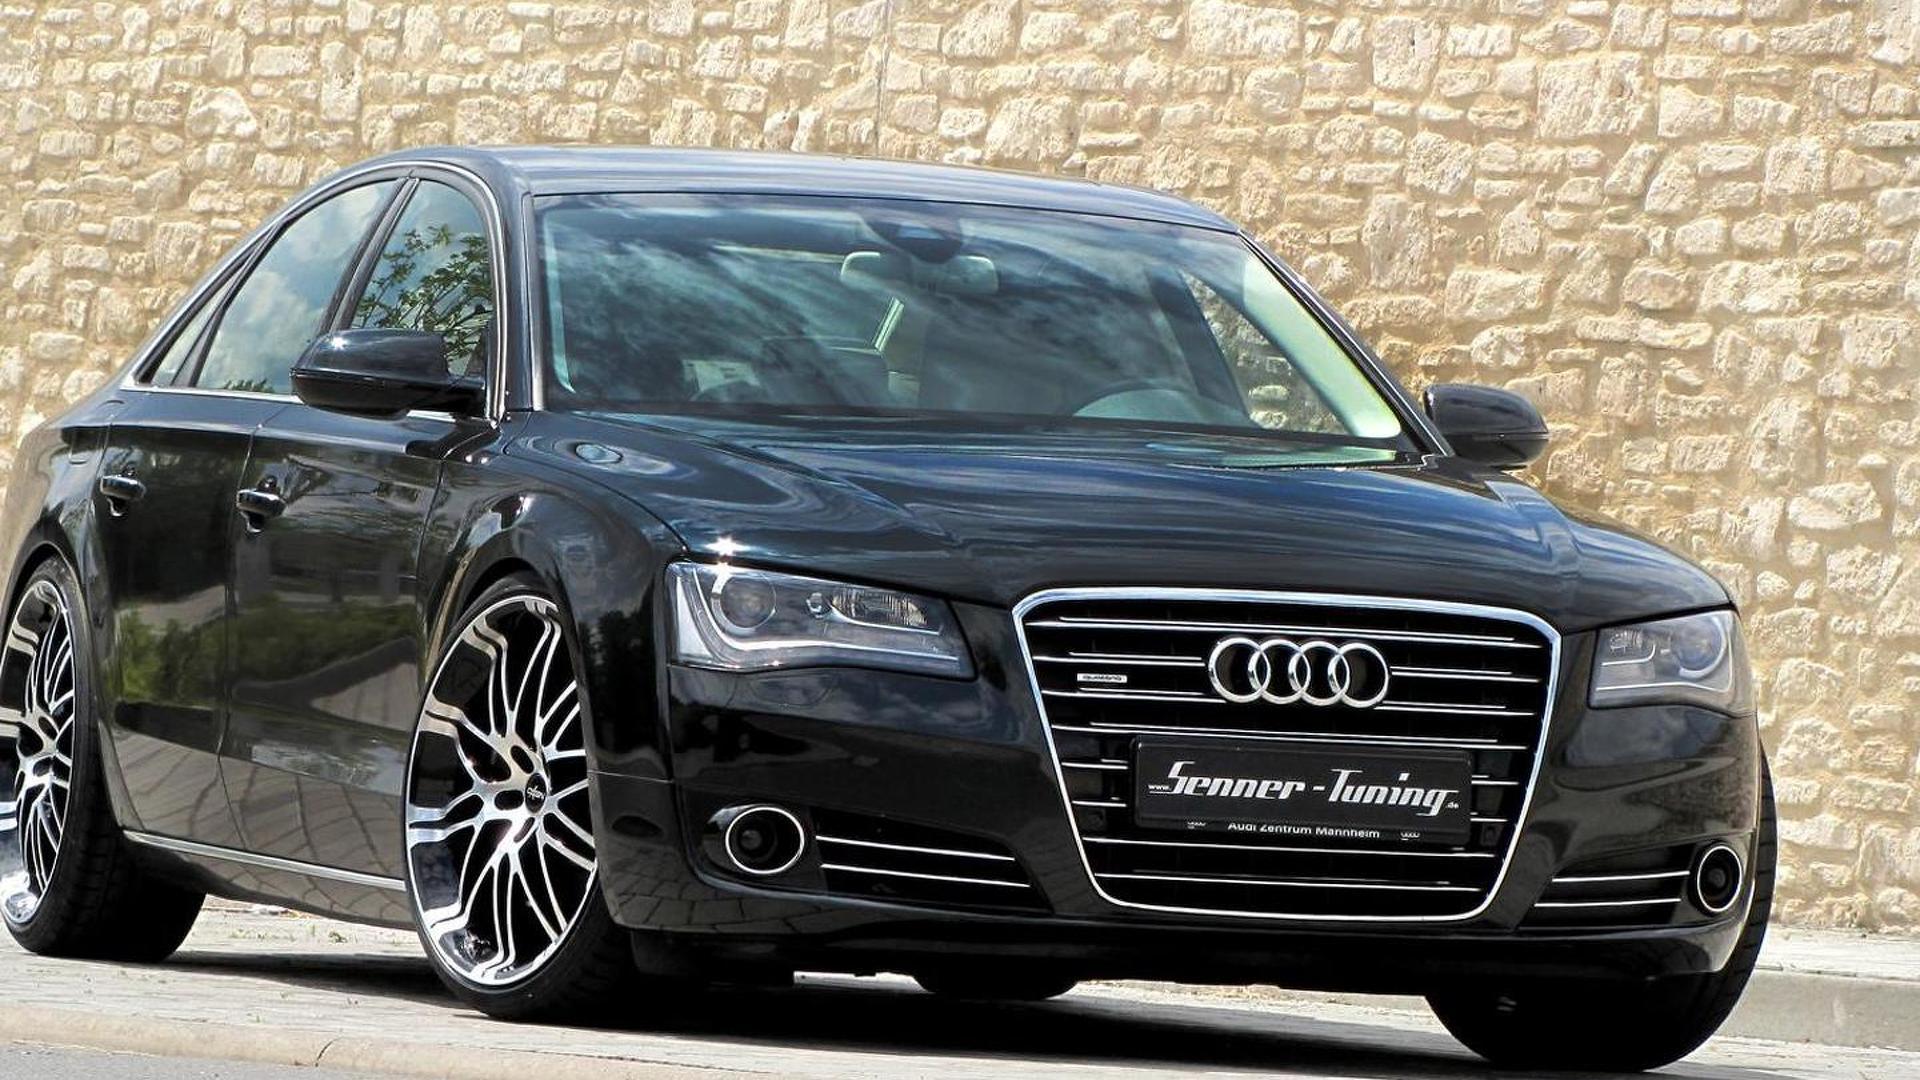 Kelebihan Kekurangan Audi 4.2 V8 Murah Berkualitas